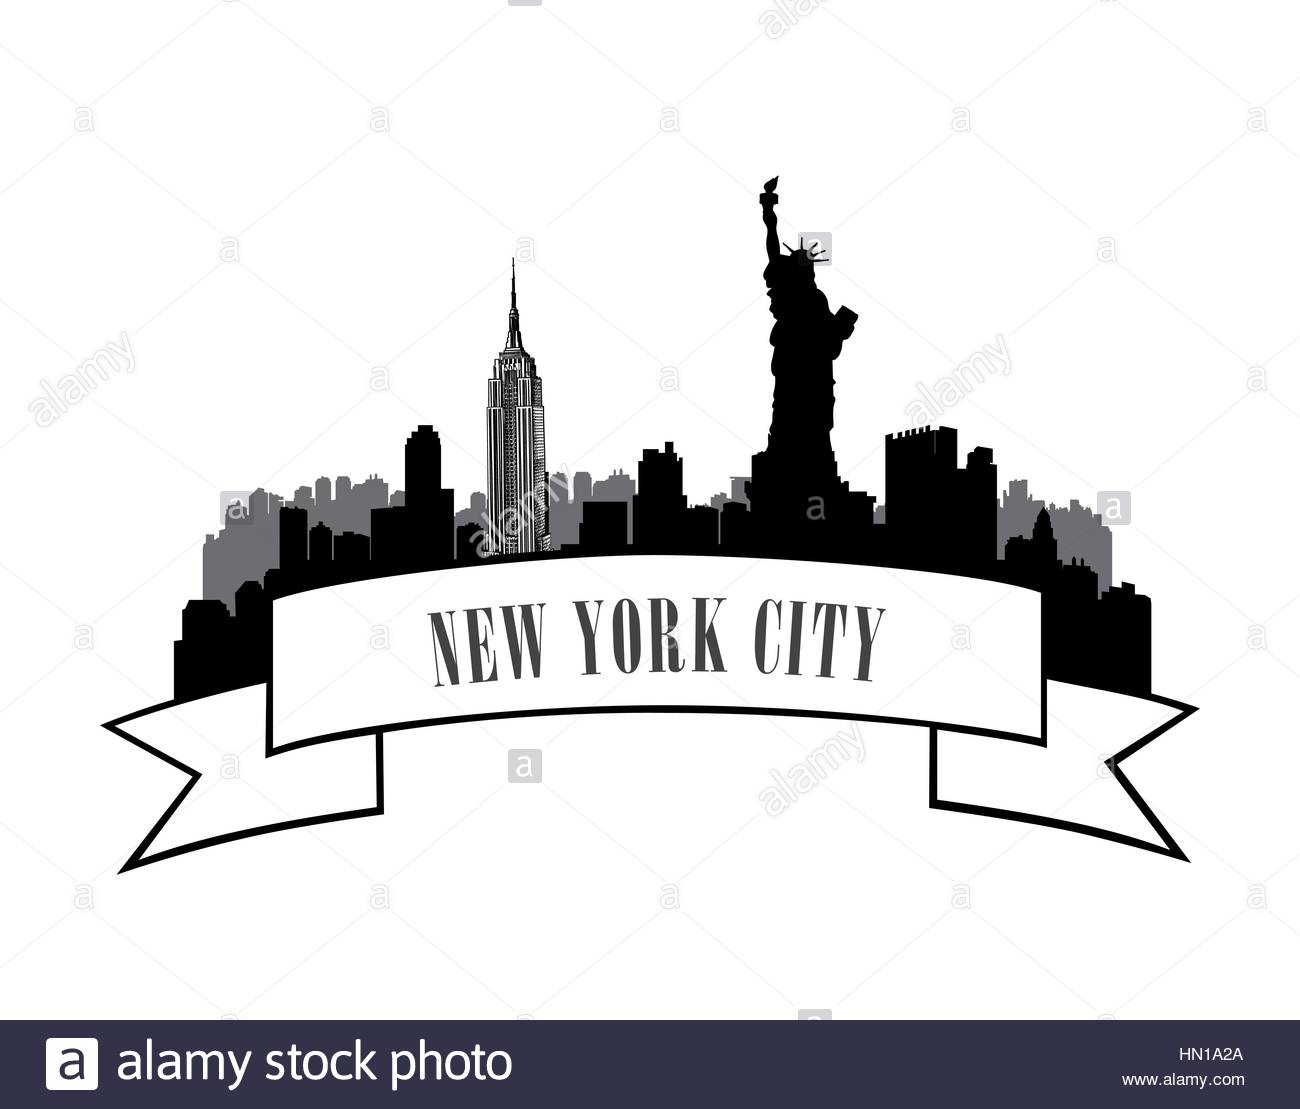 1300x1109 New York City Skyline Illustration Stock Photos Amp New York City